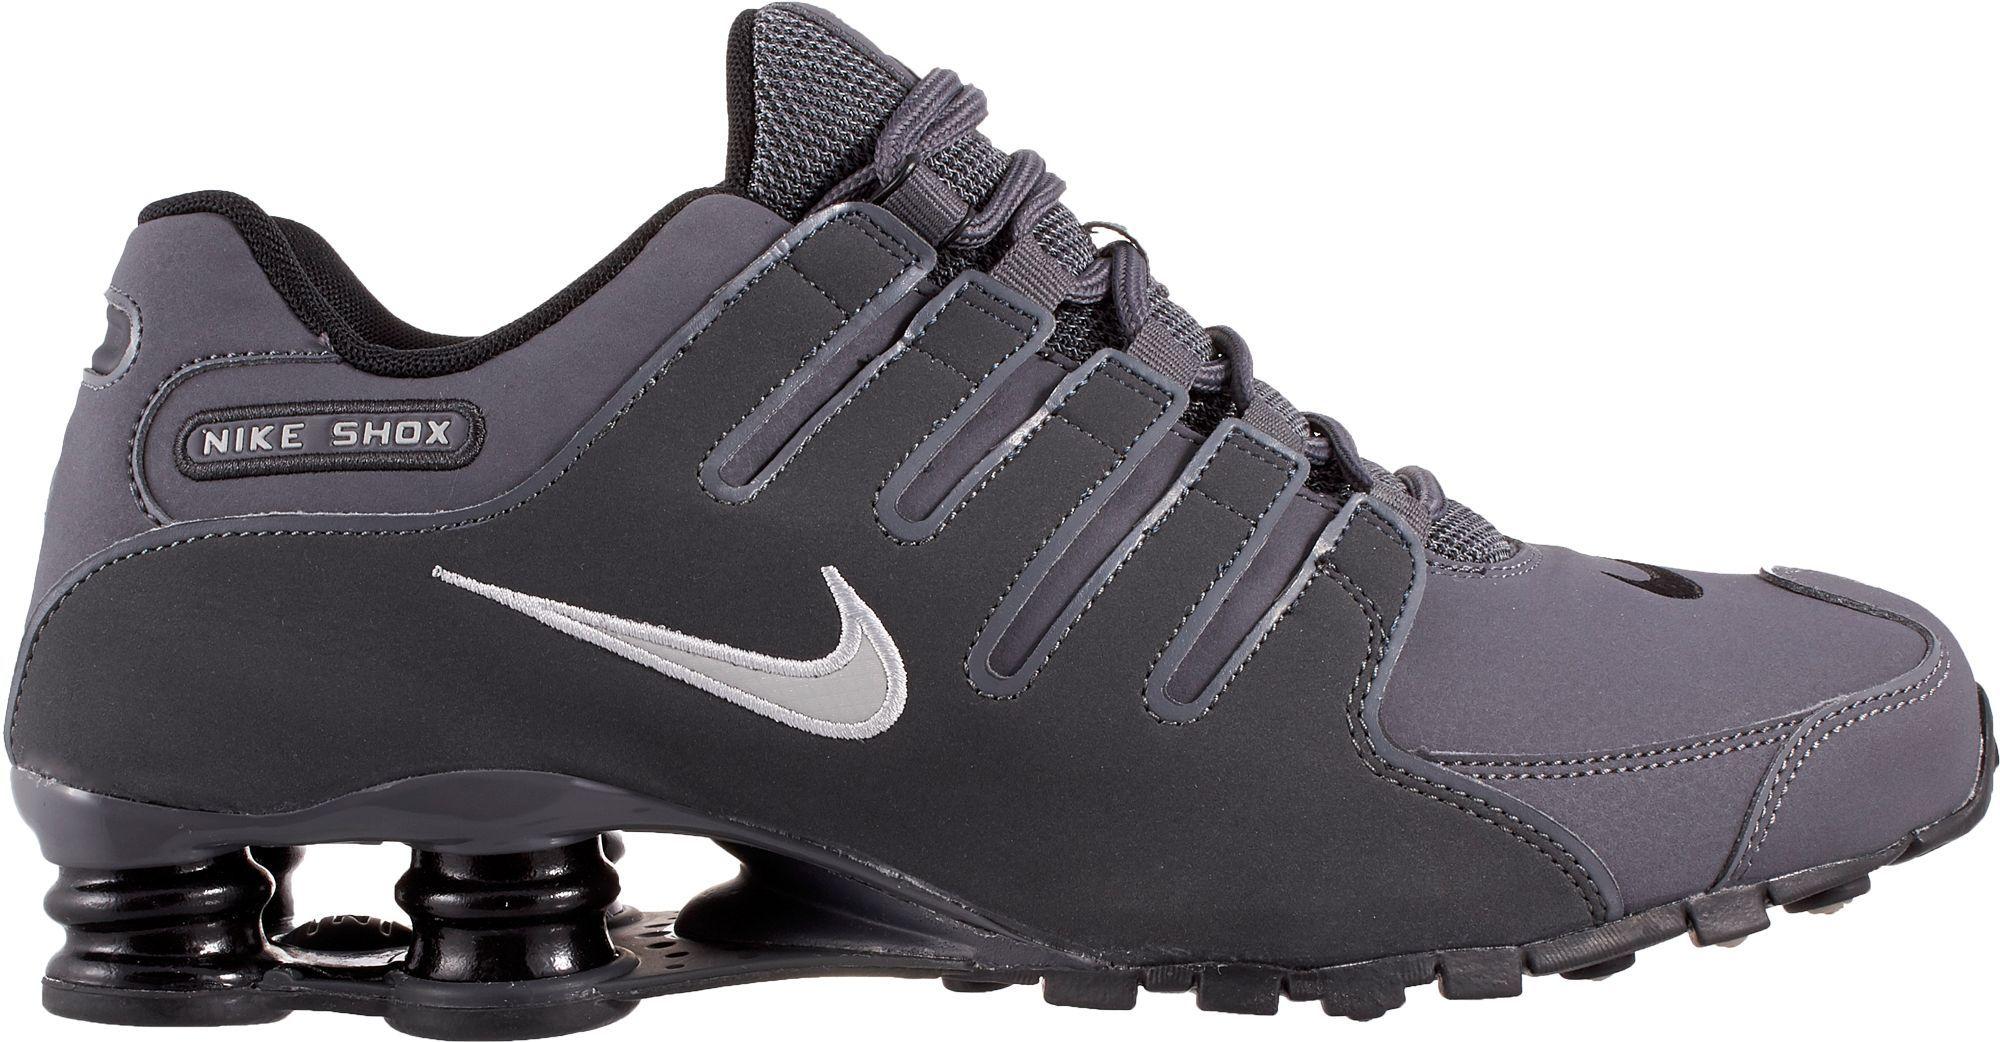 Mens nike shox, Nike shoes online, Nike